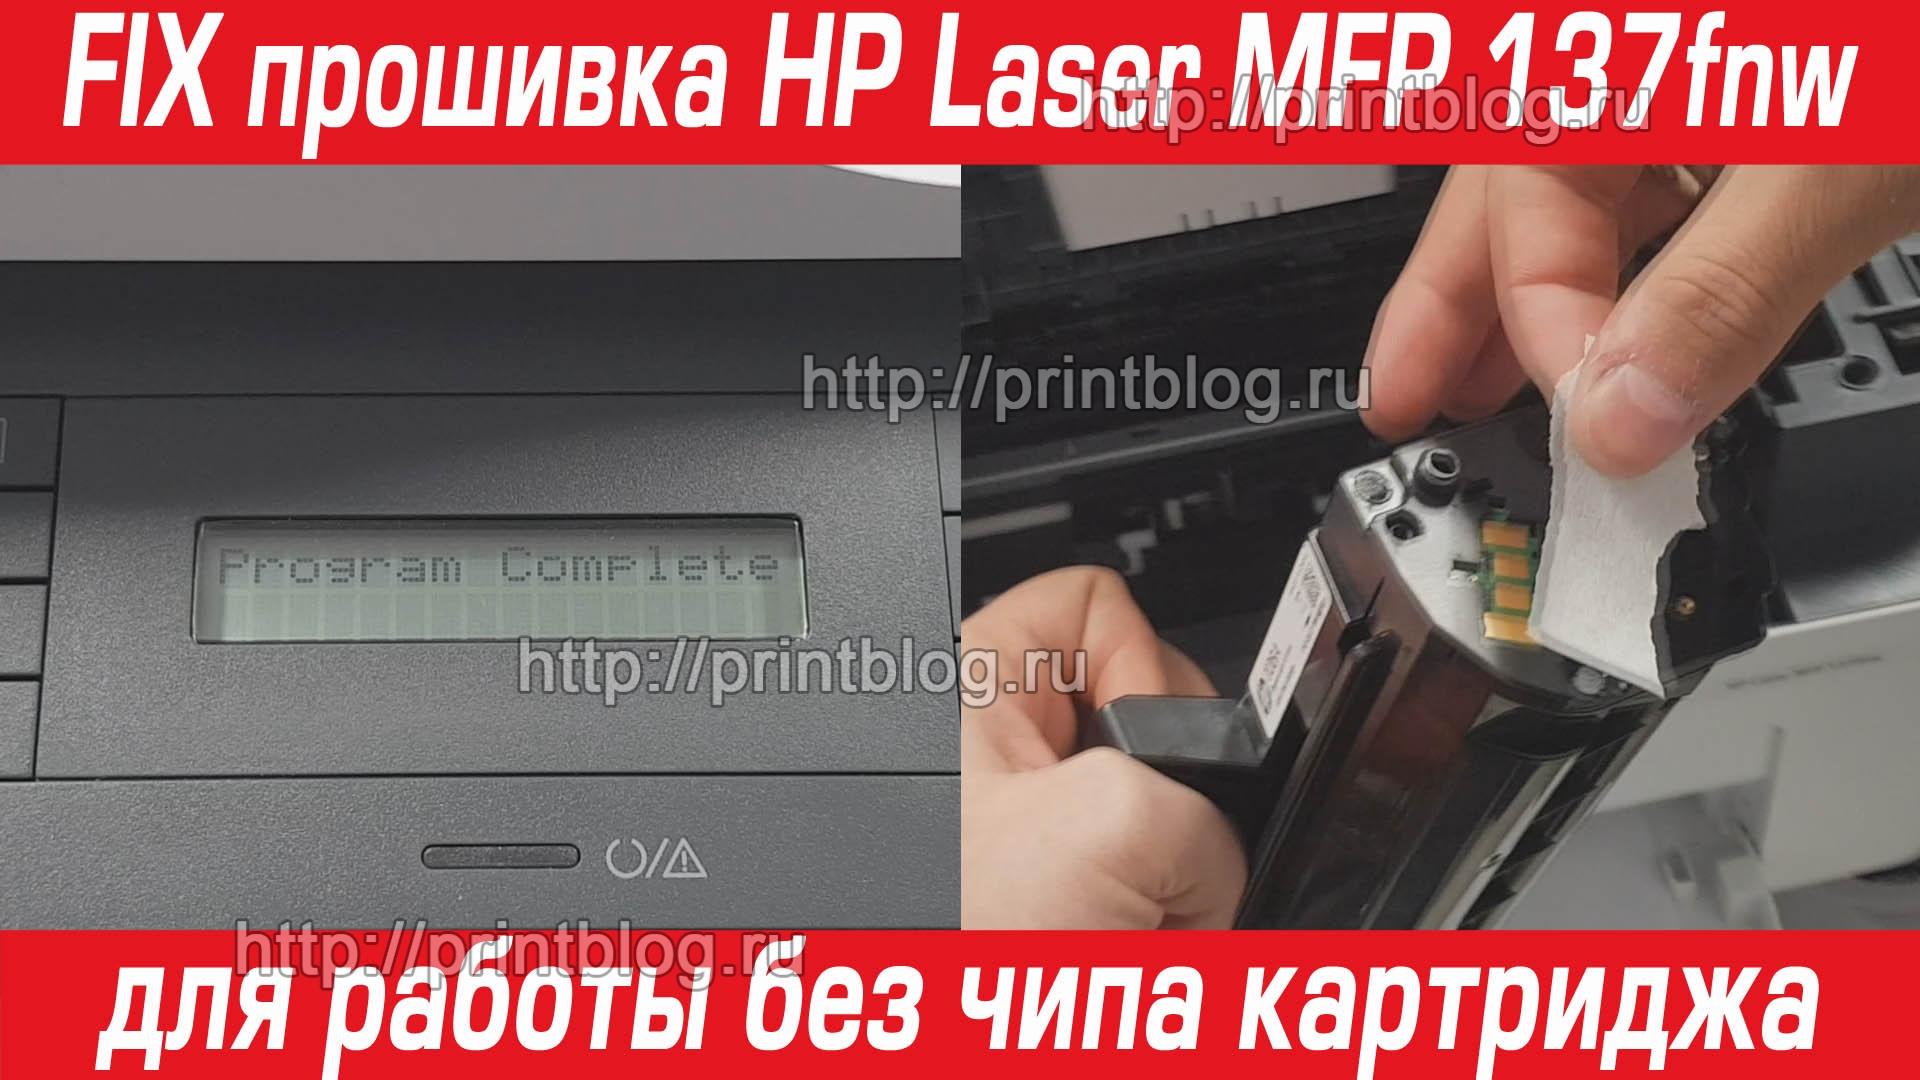 FIX прошивка HP Laser MFP 137fnw для работы без чипа картриджа за 10 минут